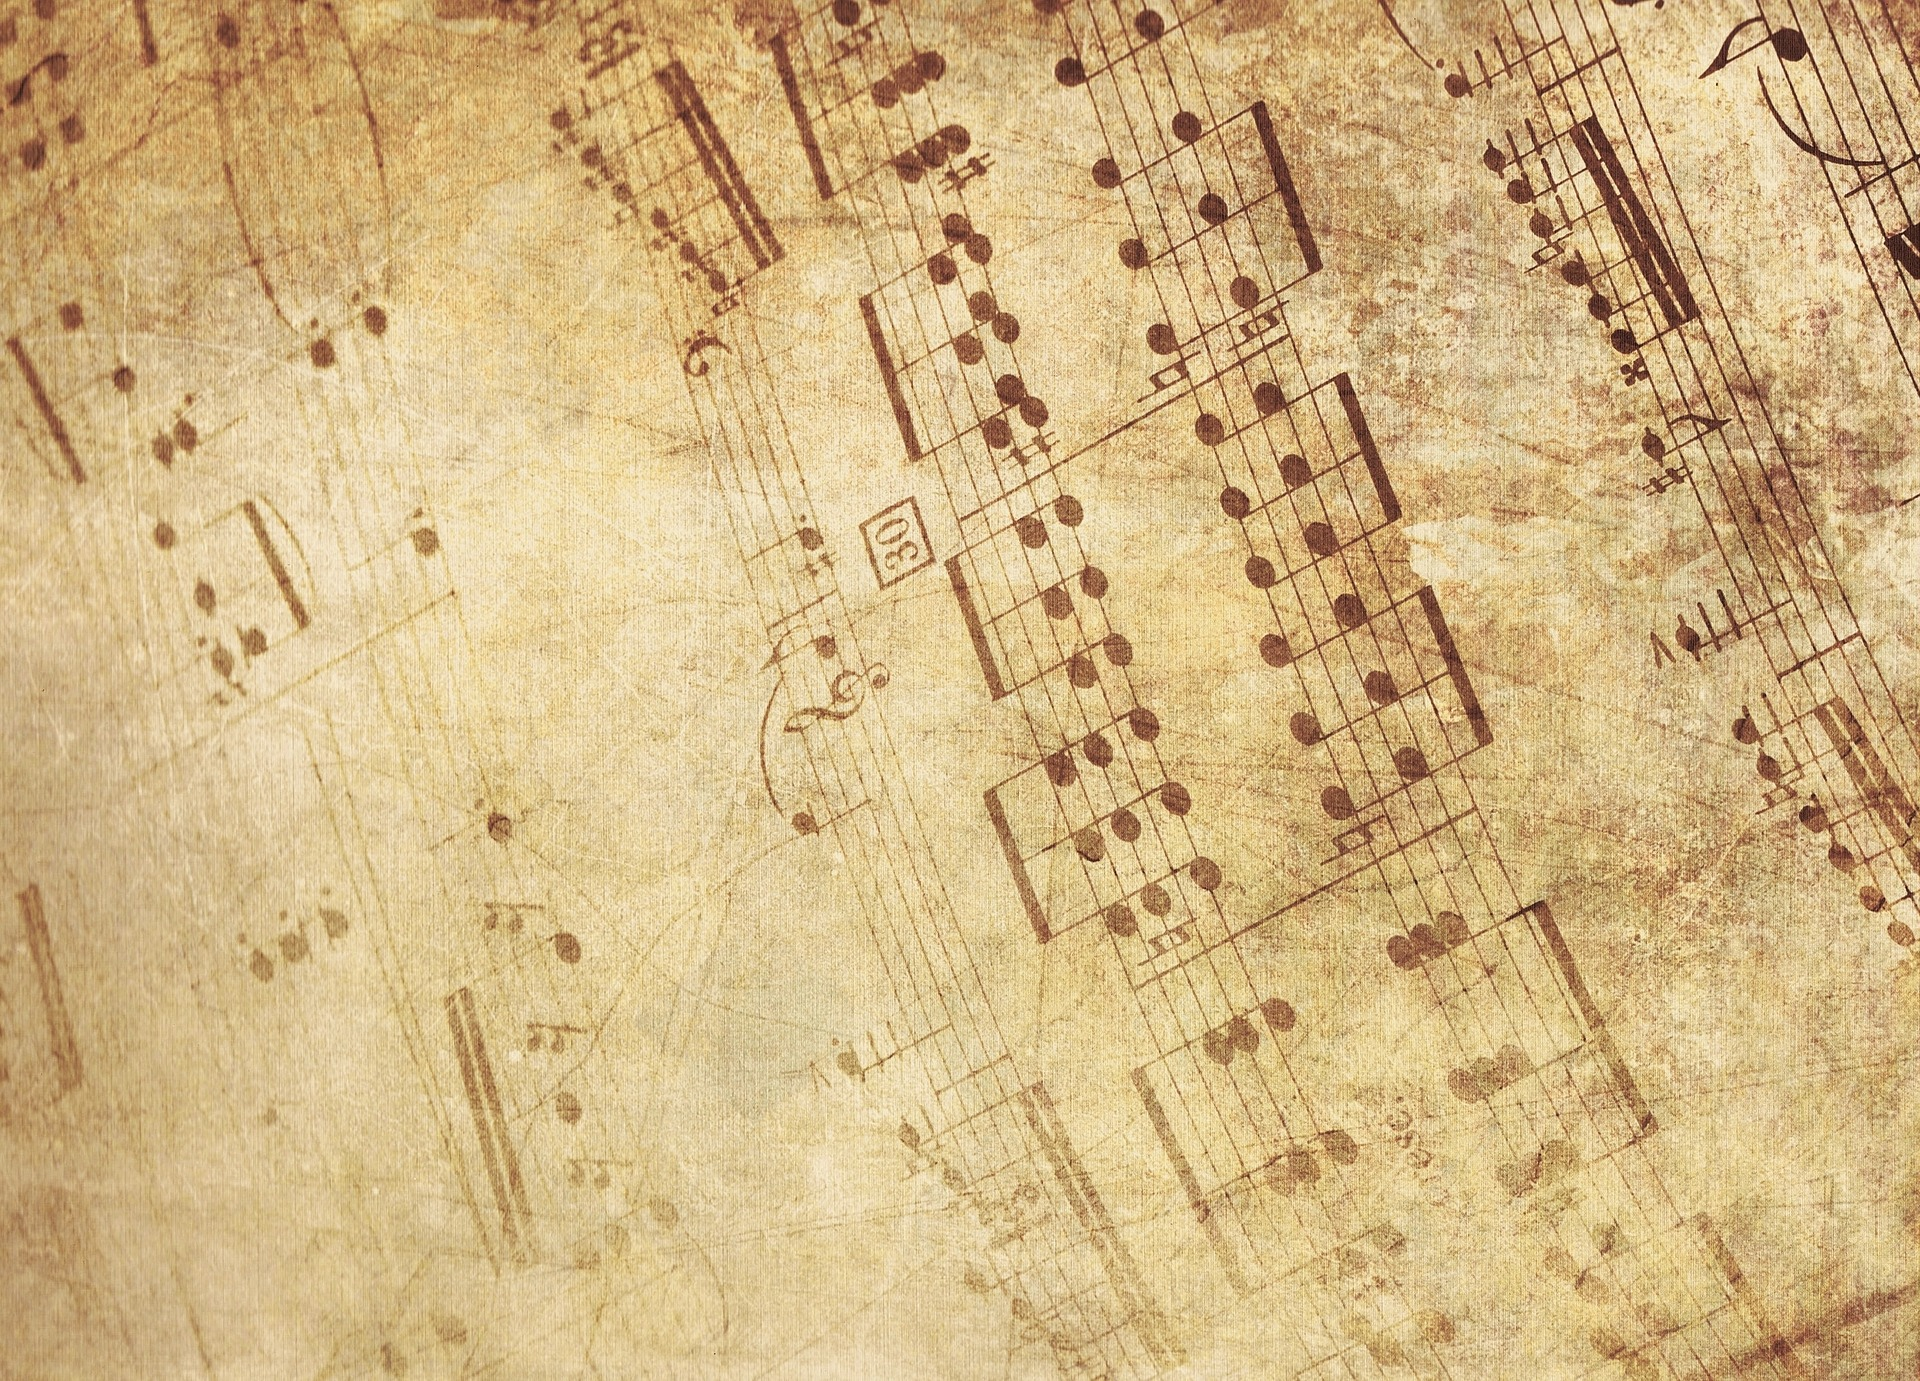 Music Pixabay